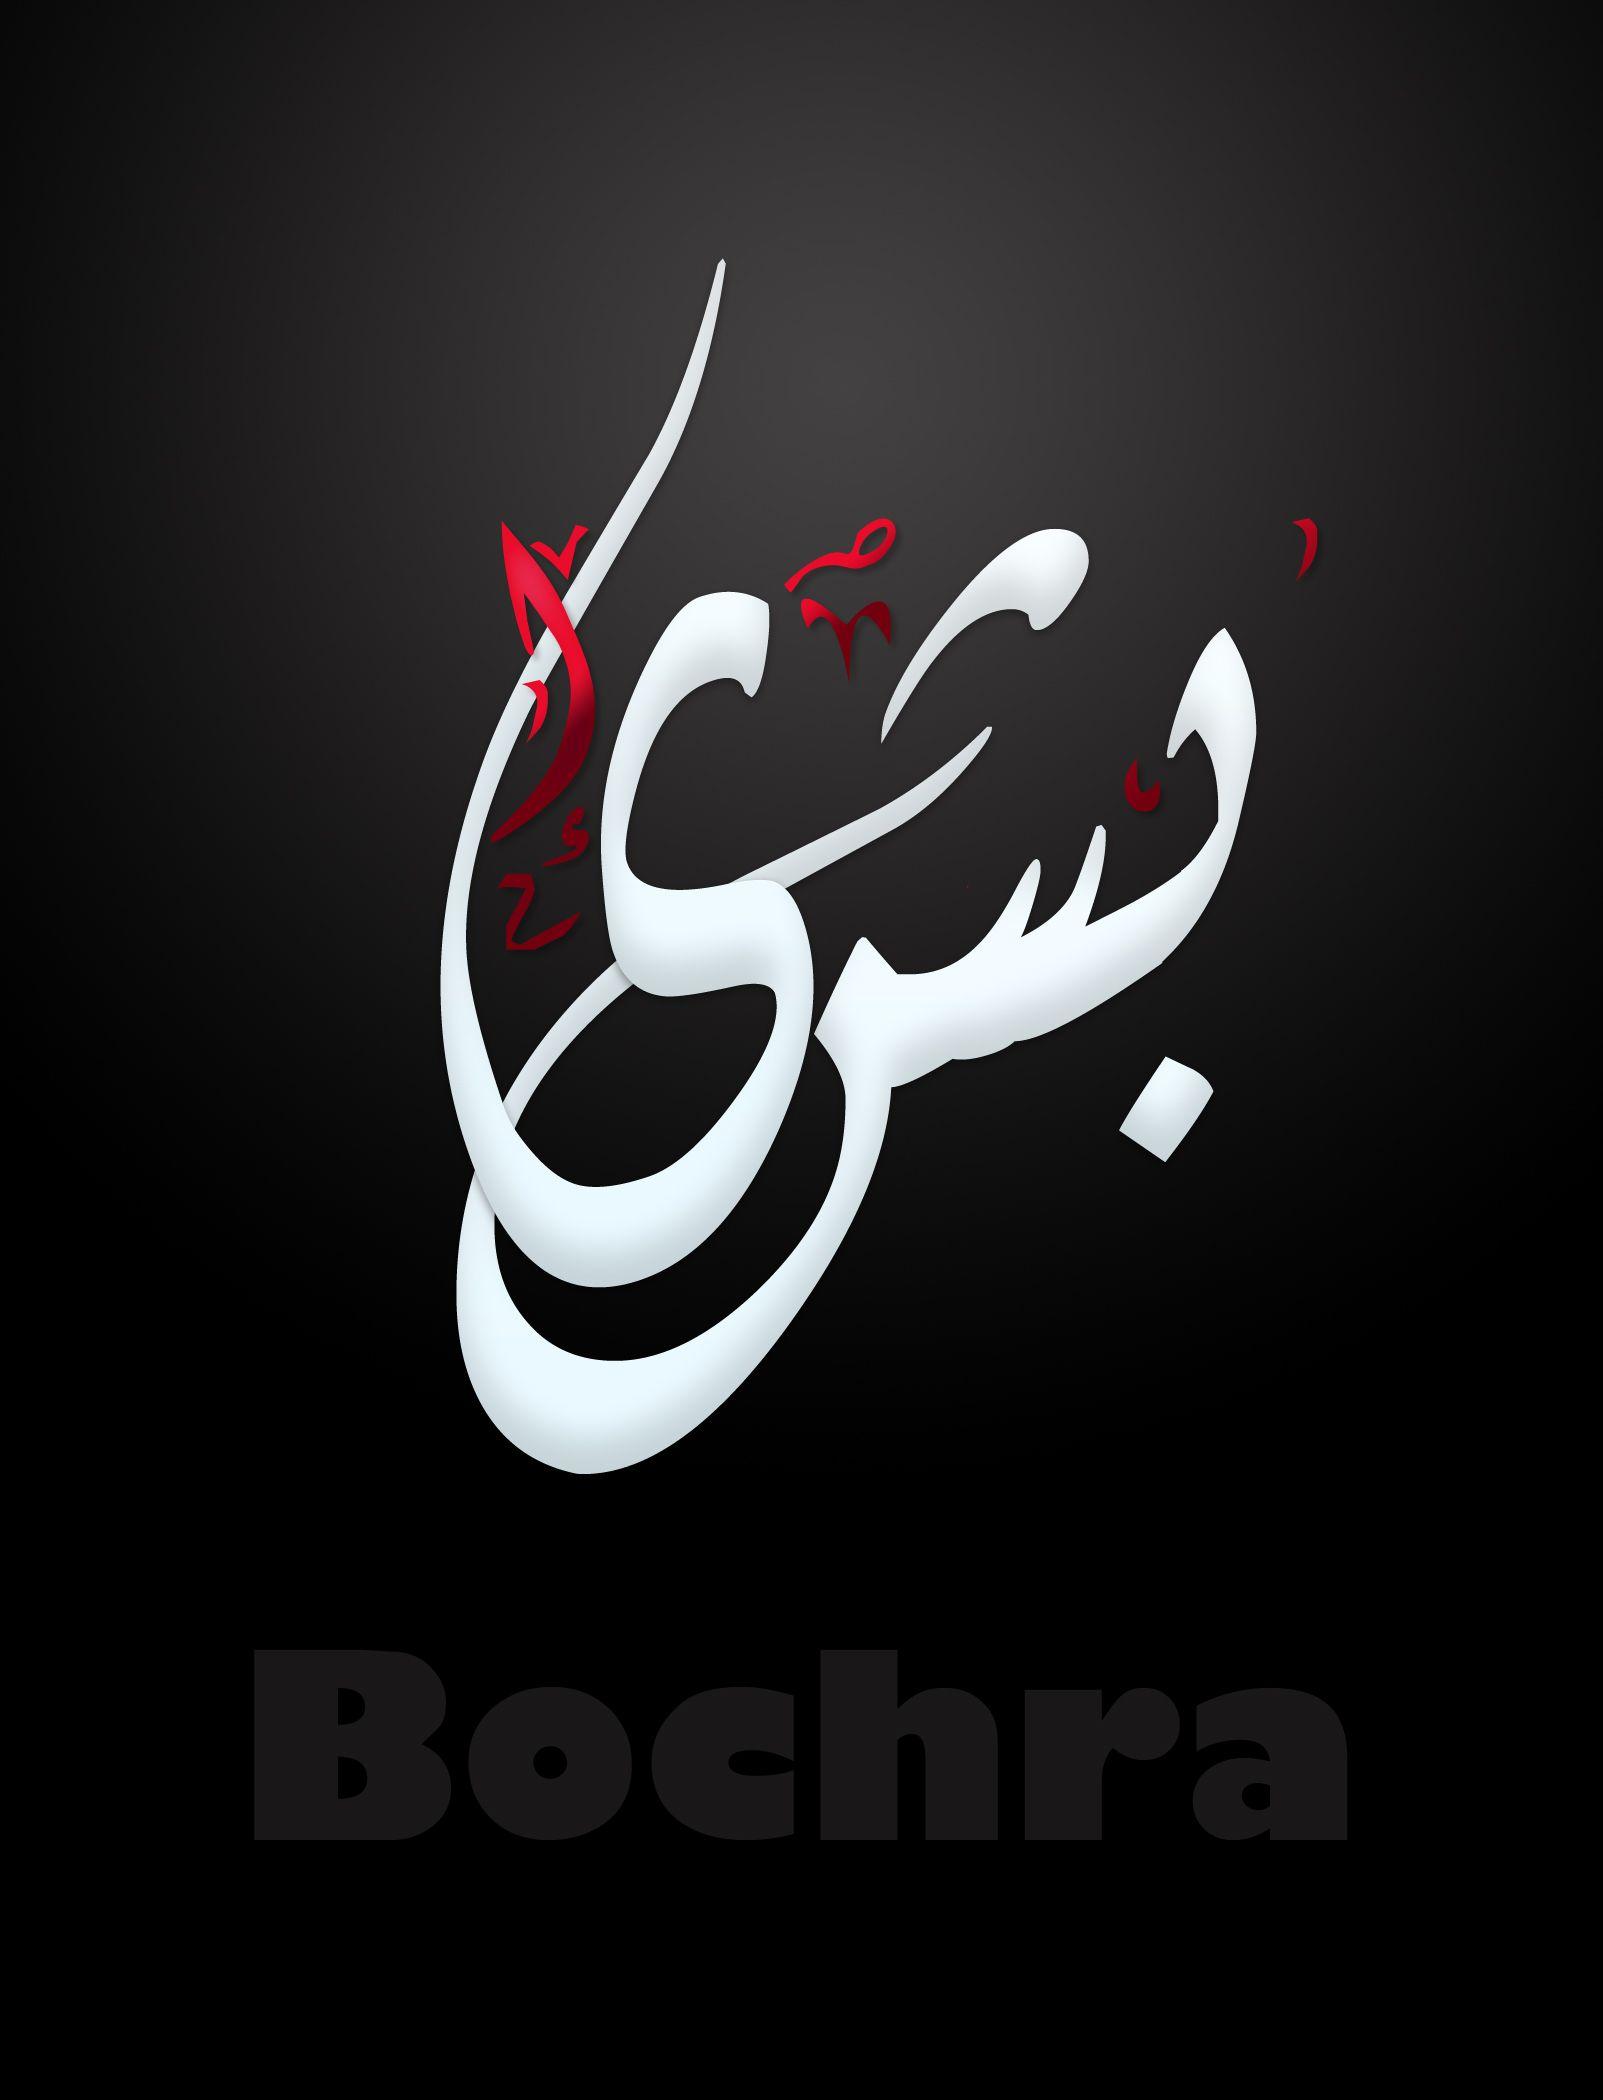 Bochera بشرى Monogram Logo Design Calligraphy Name Islamic Art Calligraphy